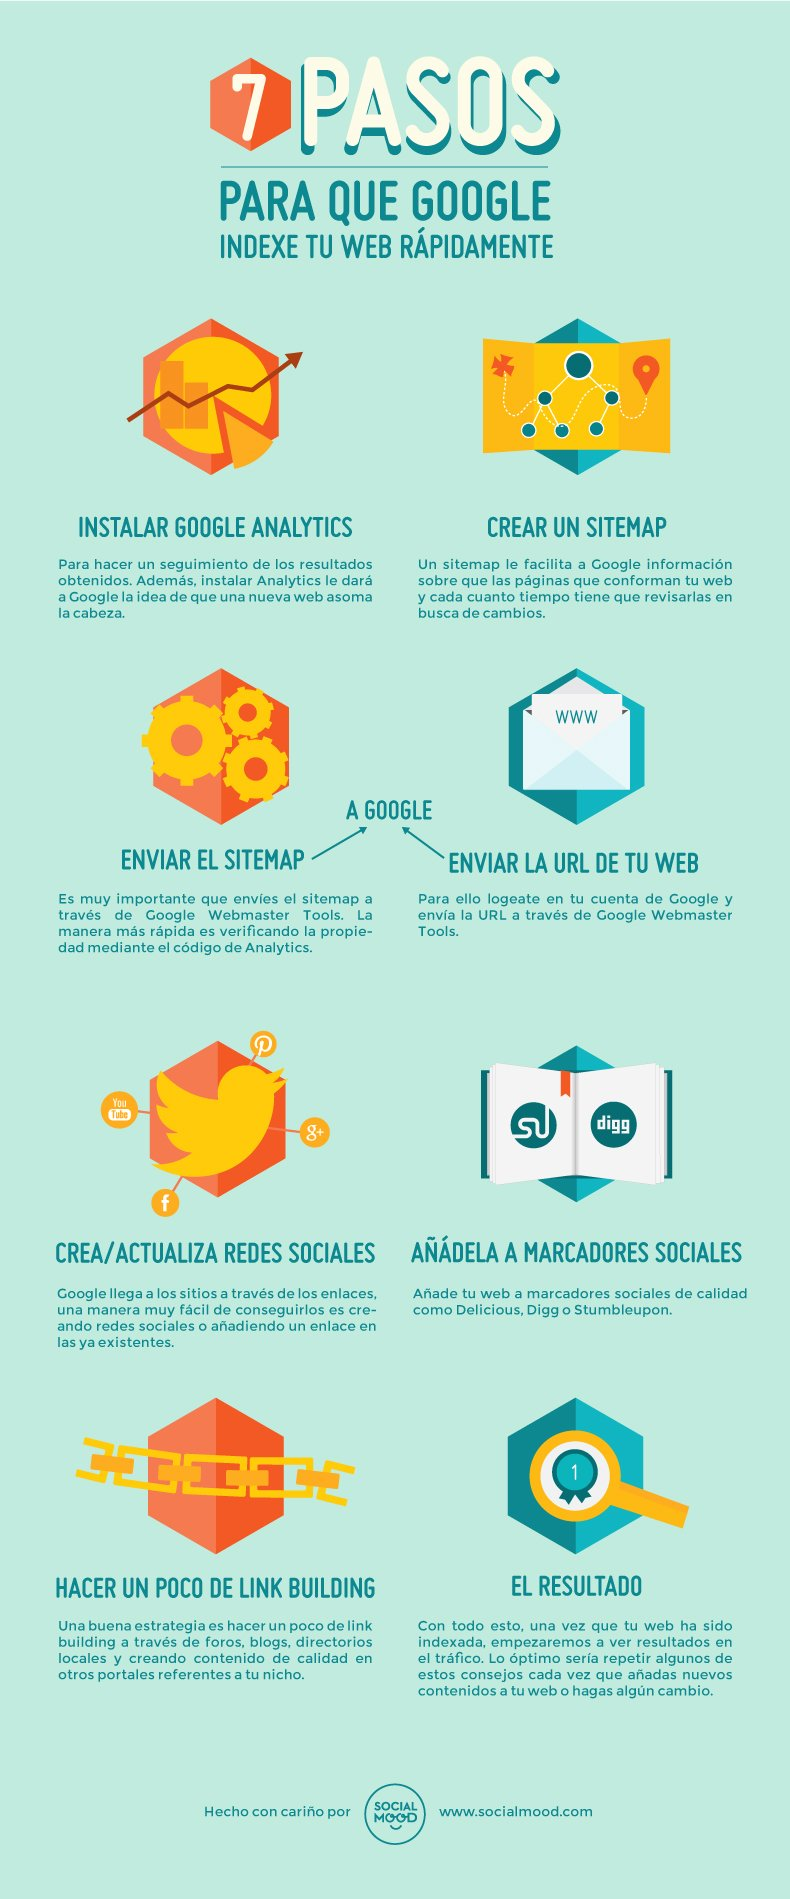 pasos-para-que-google-indexe-tu-web